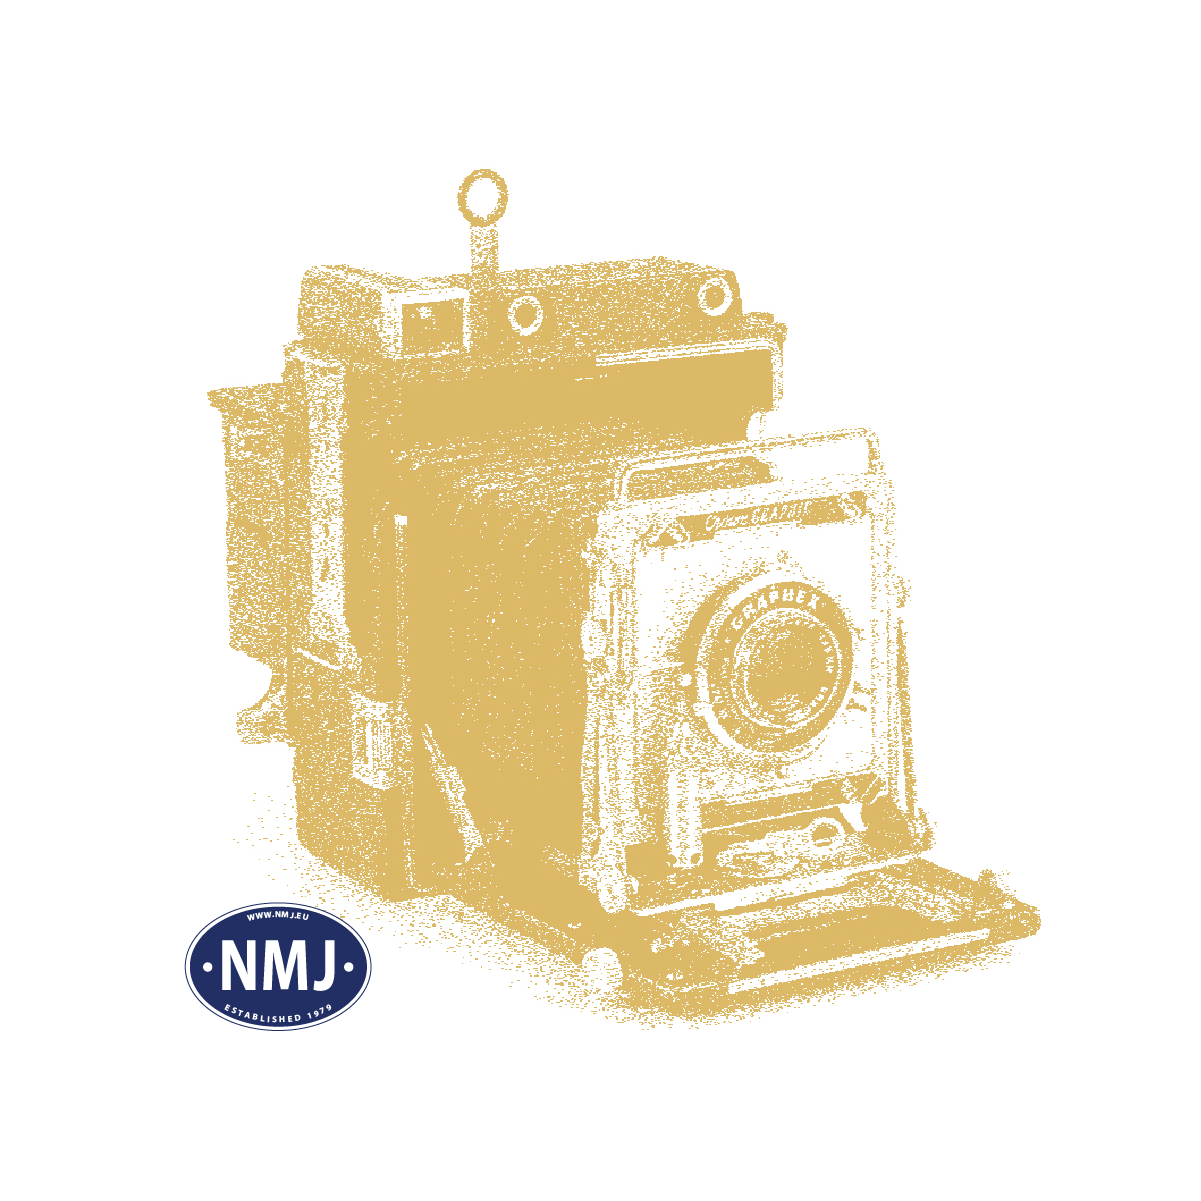 NMJT95302 - NMJ Topline CFL 1603 (1956-1971), AC m/ Lyd